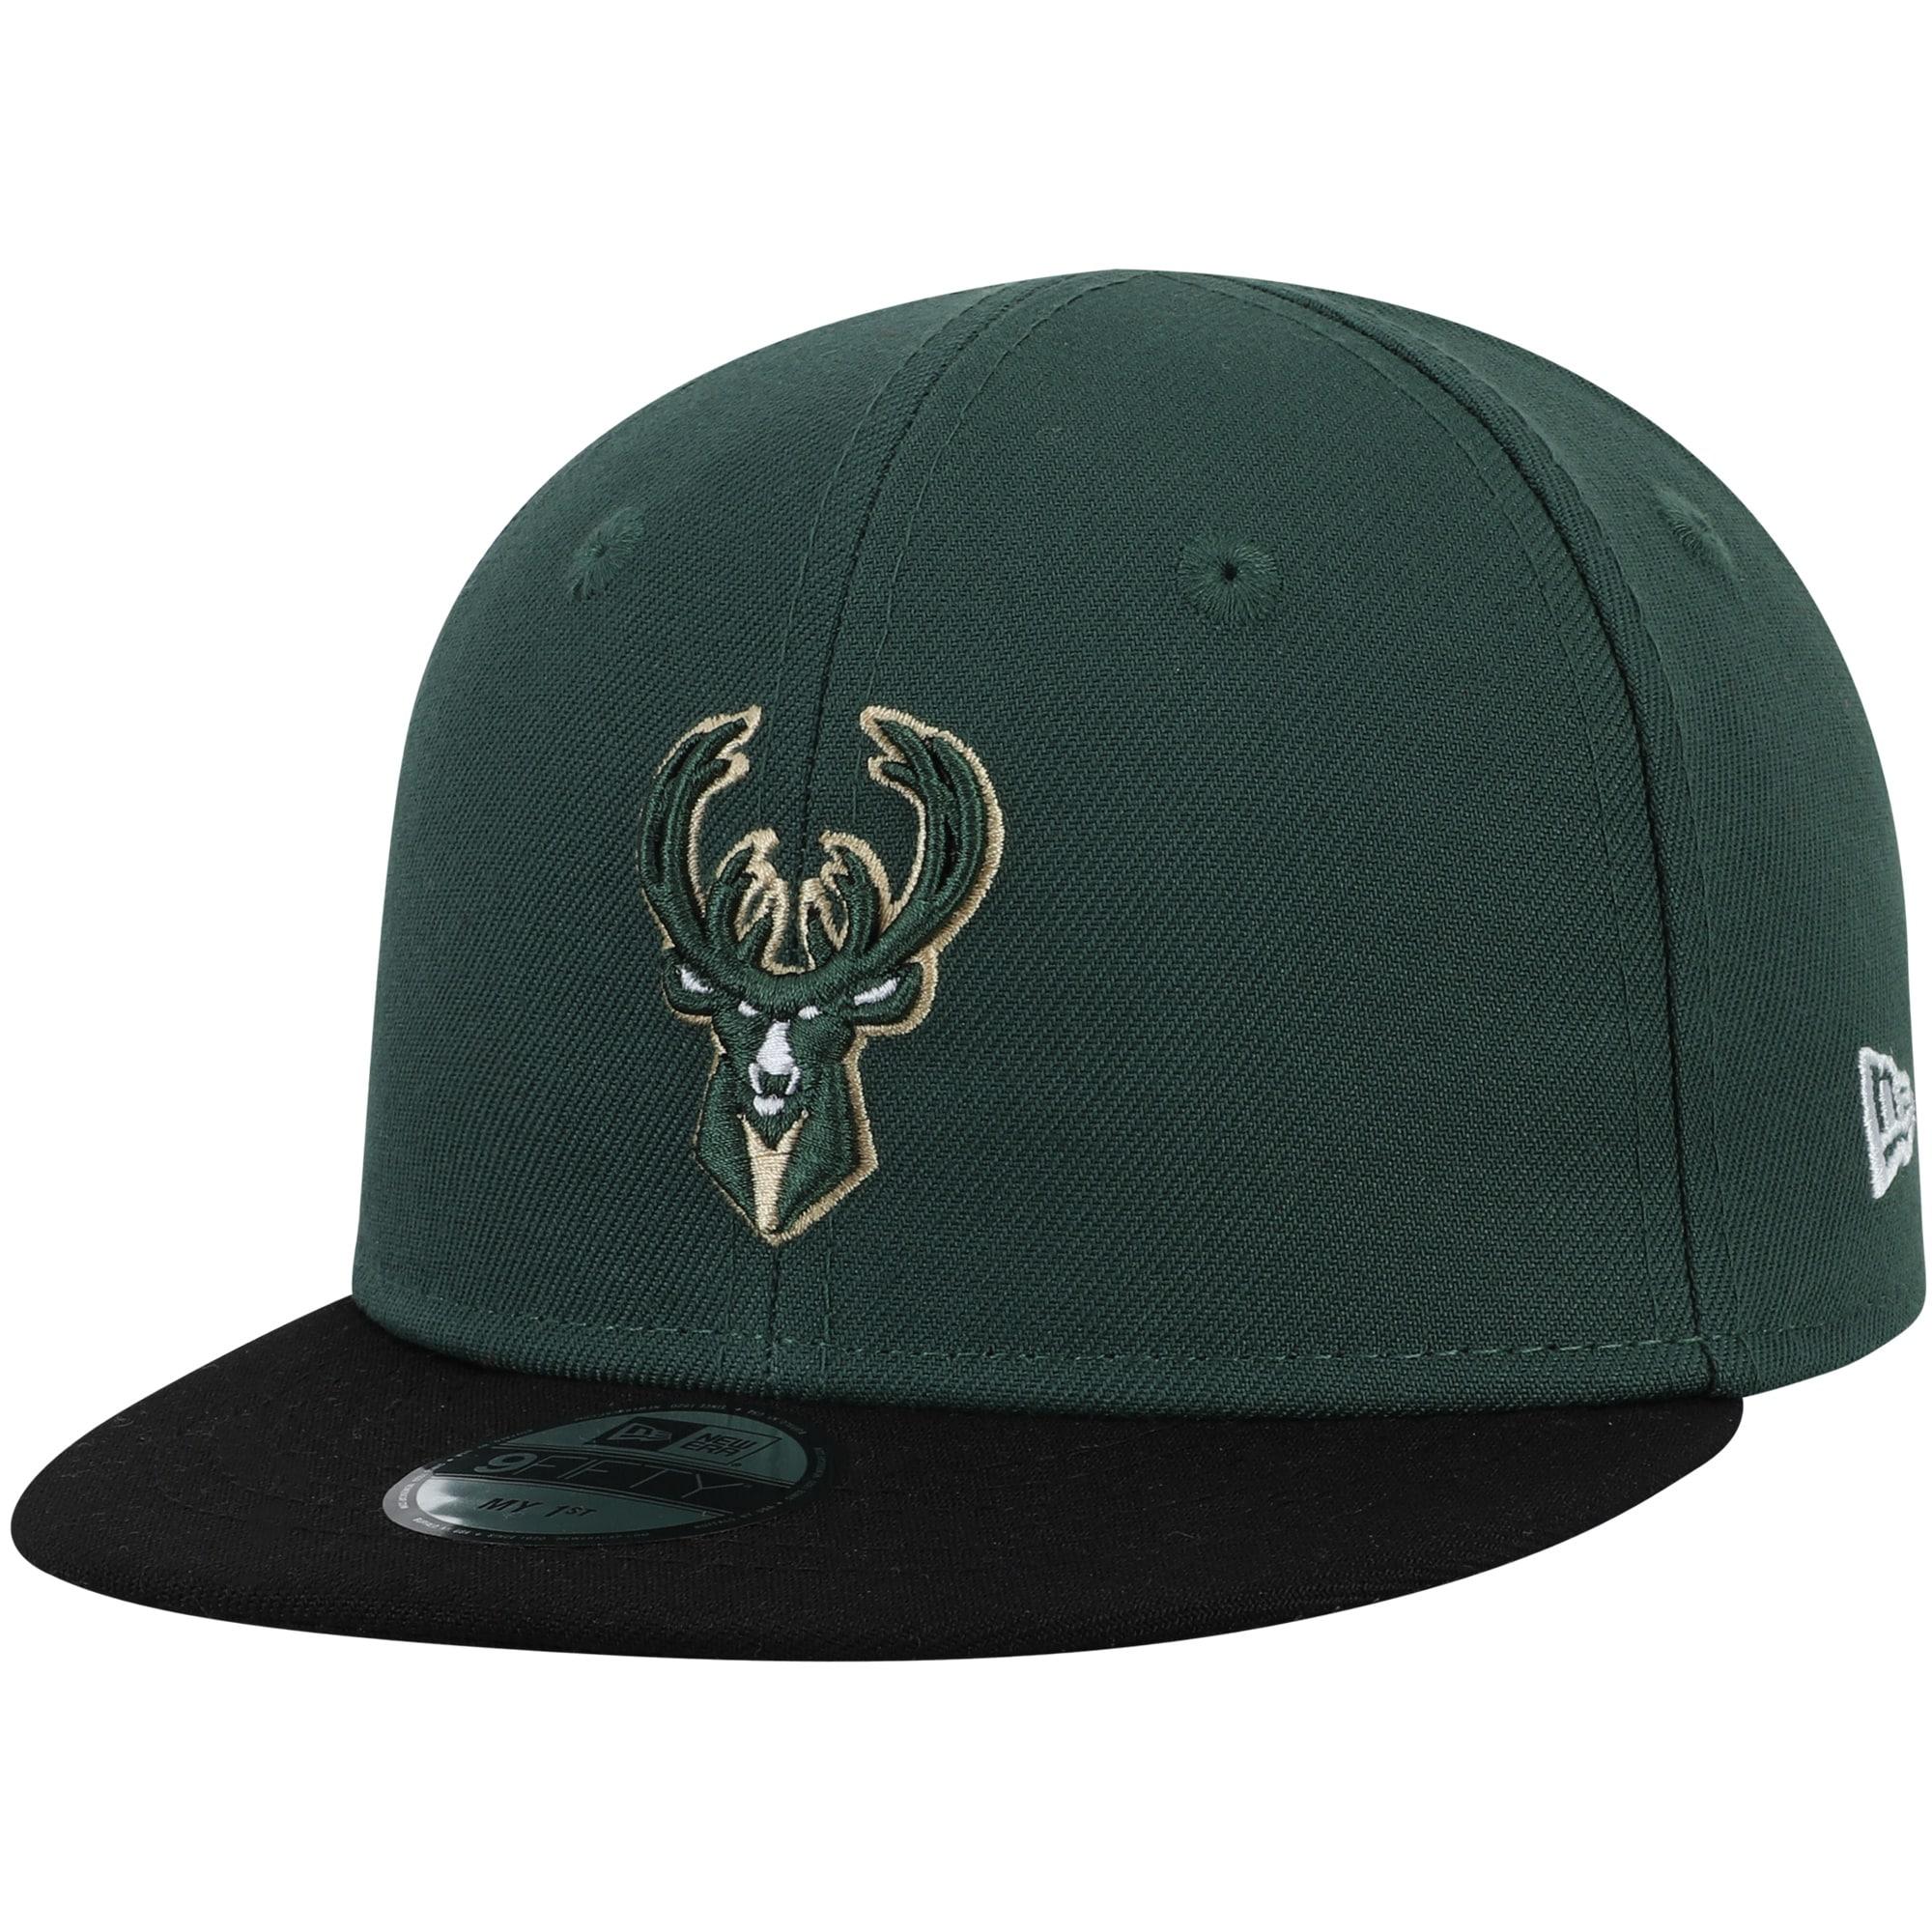 Milwaukee Bucks New Era Infant My First 9FIFTY Adjustable Hat - Hunter Green/Black